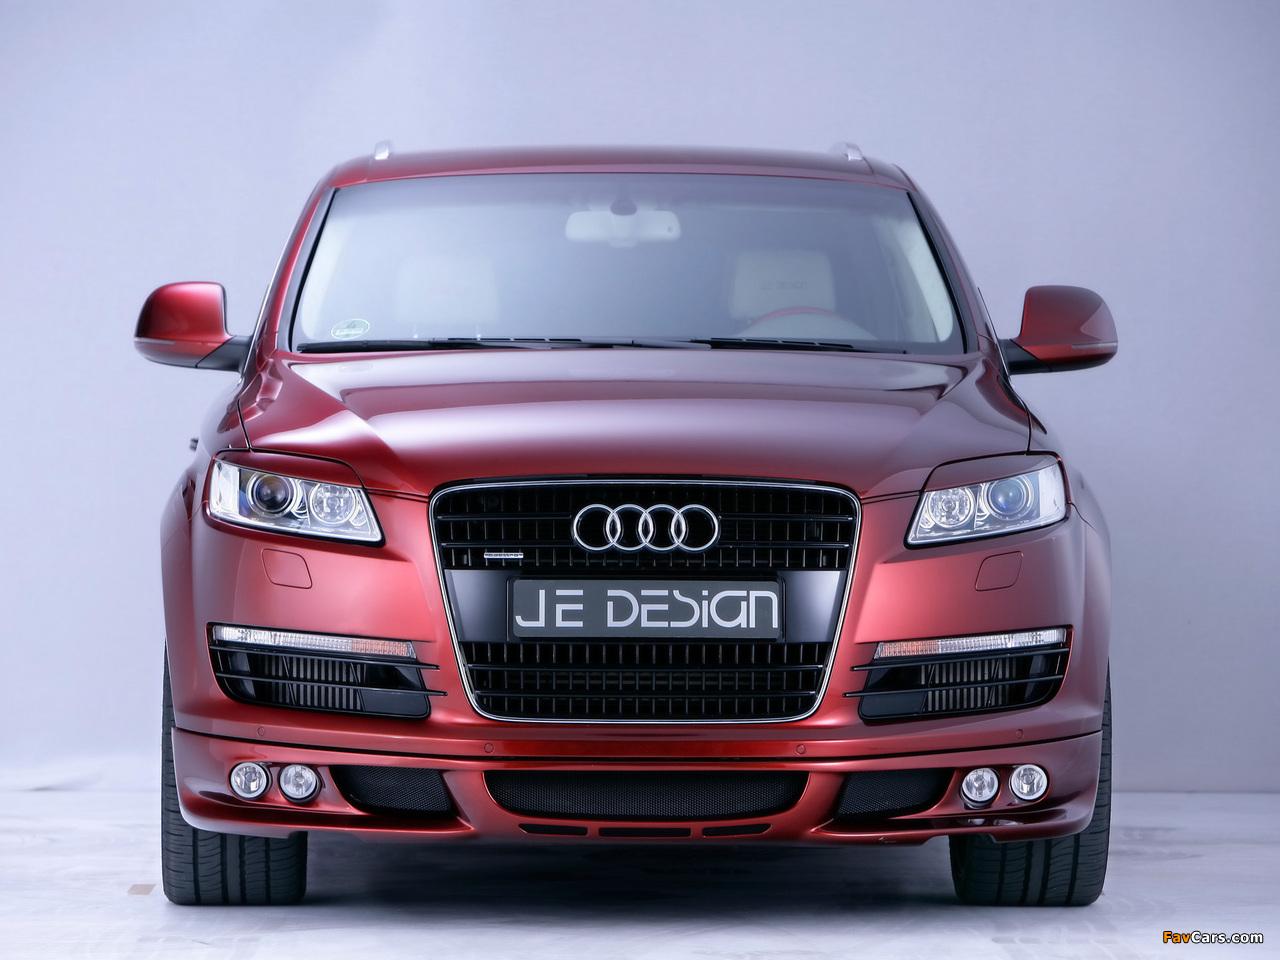 Je Design Audi Q7 Street Rocket 2007 wallpapers (1280 x 960)